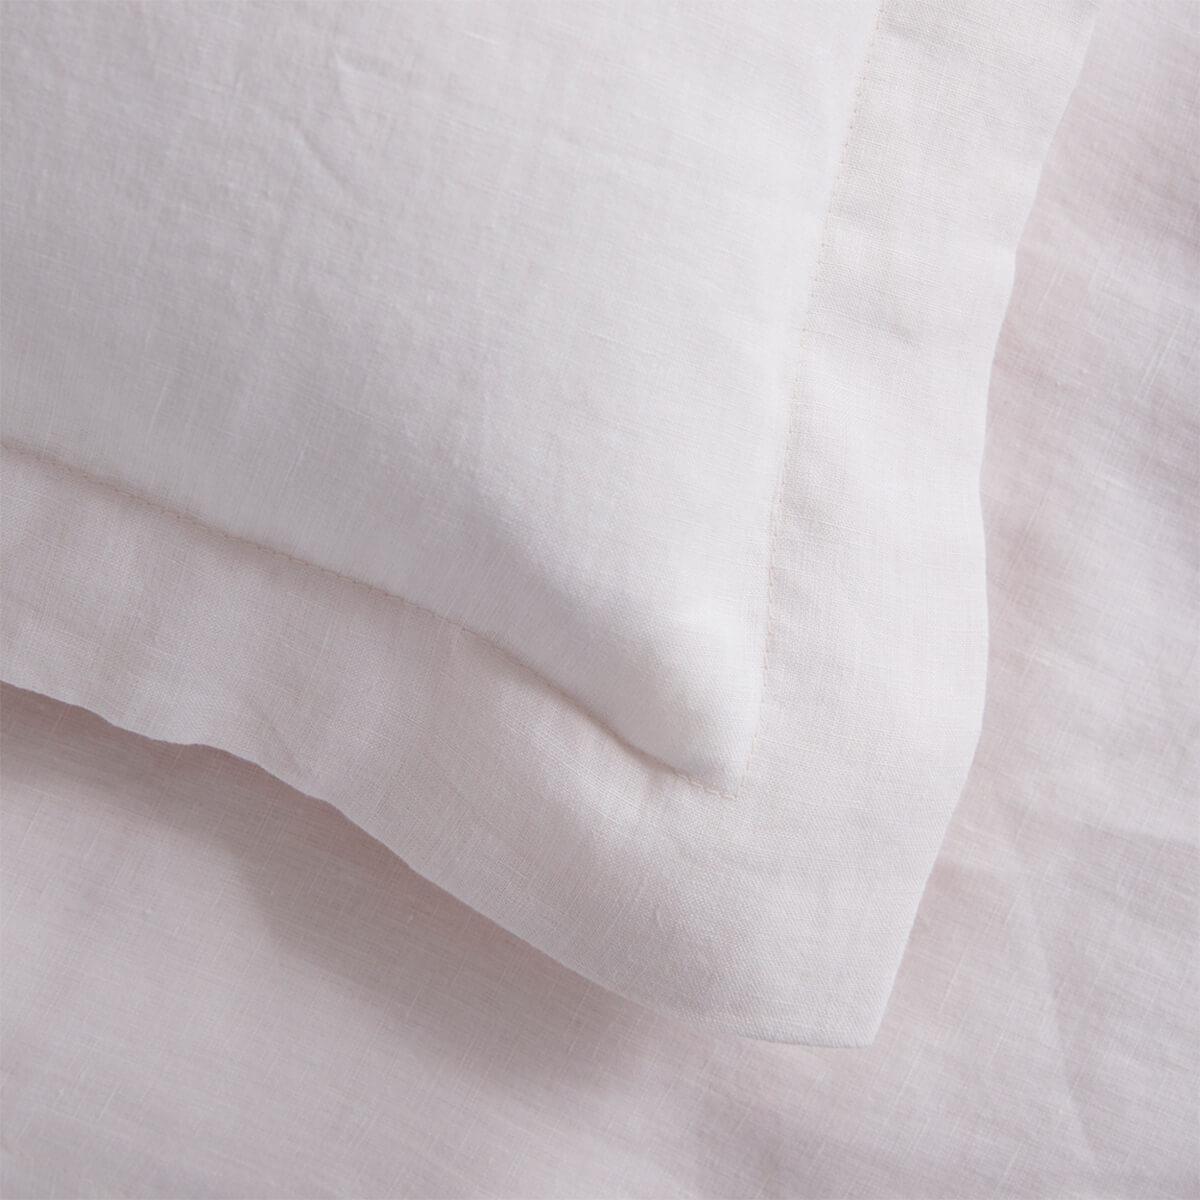 Blush Pink French Linen Superking Oxford Pillowcase Pair